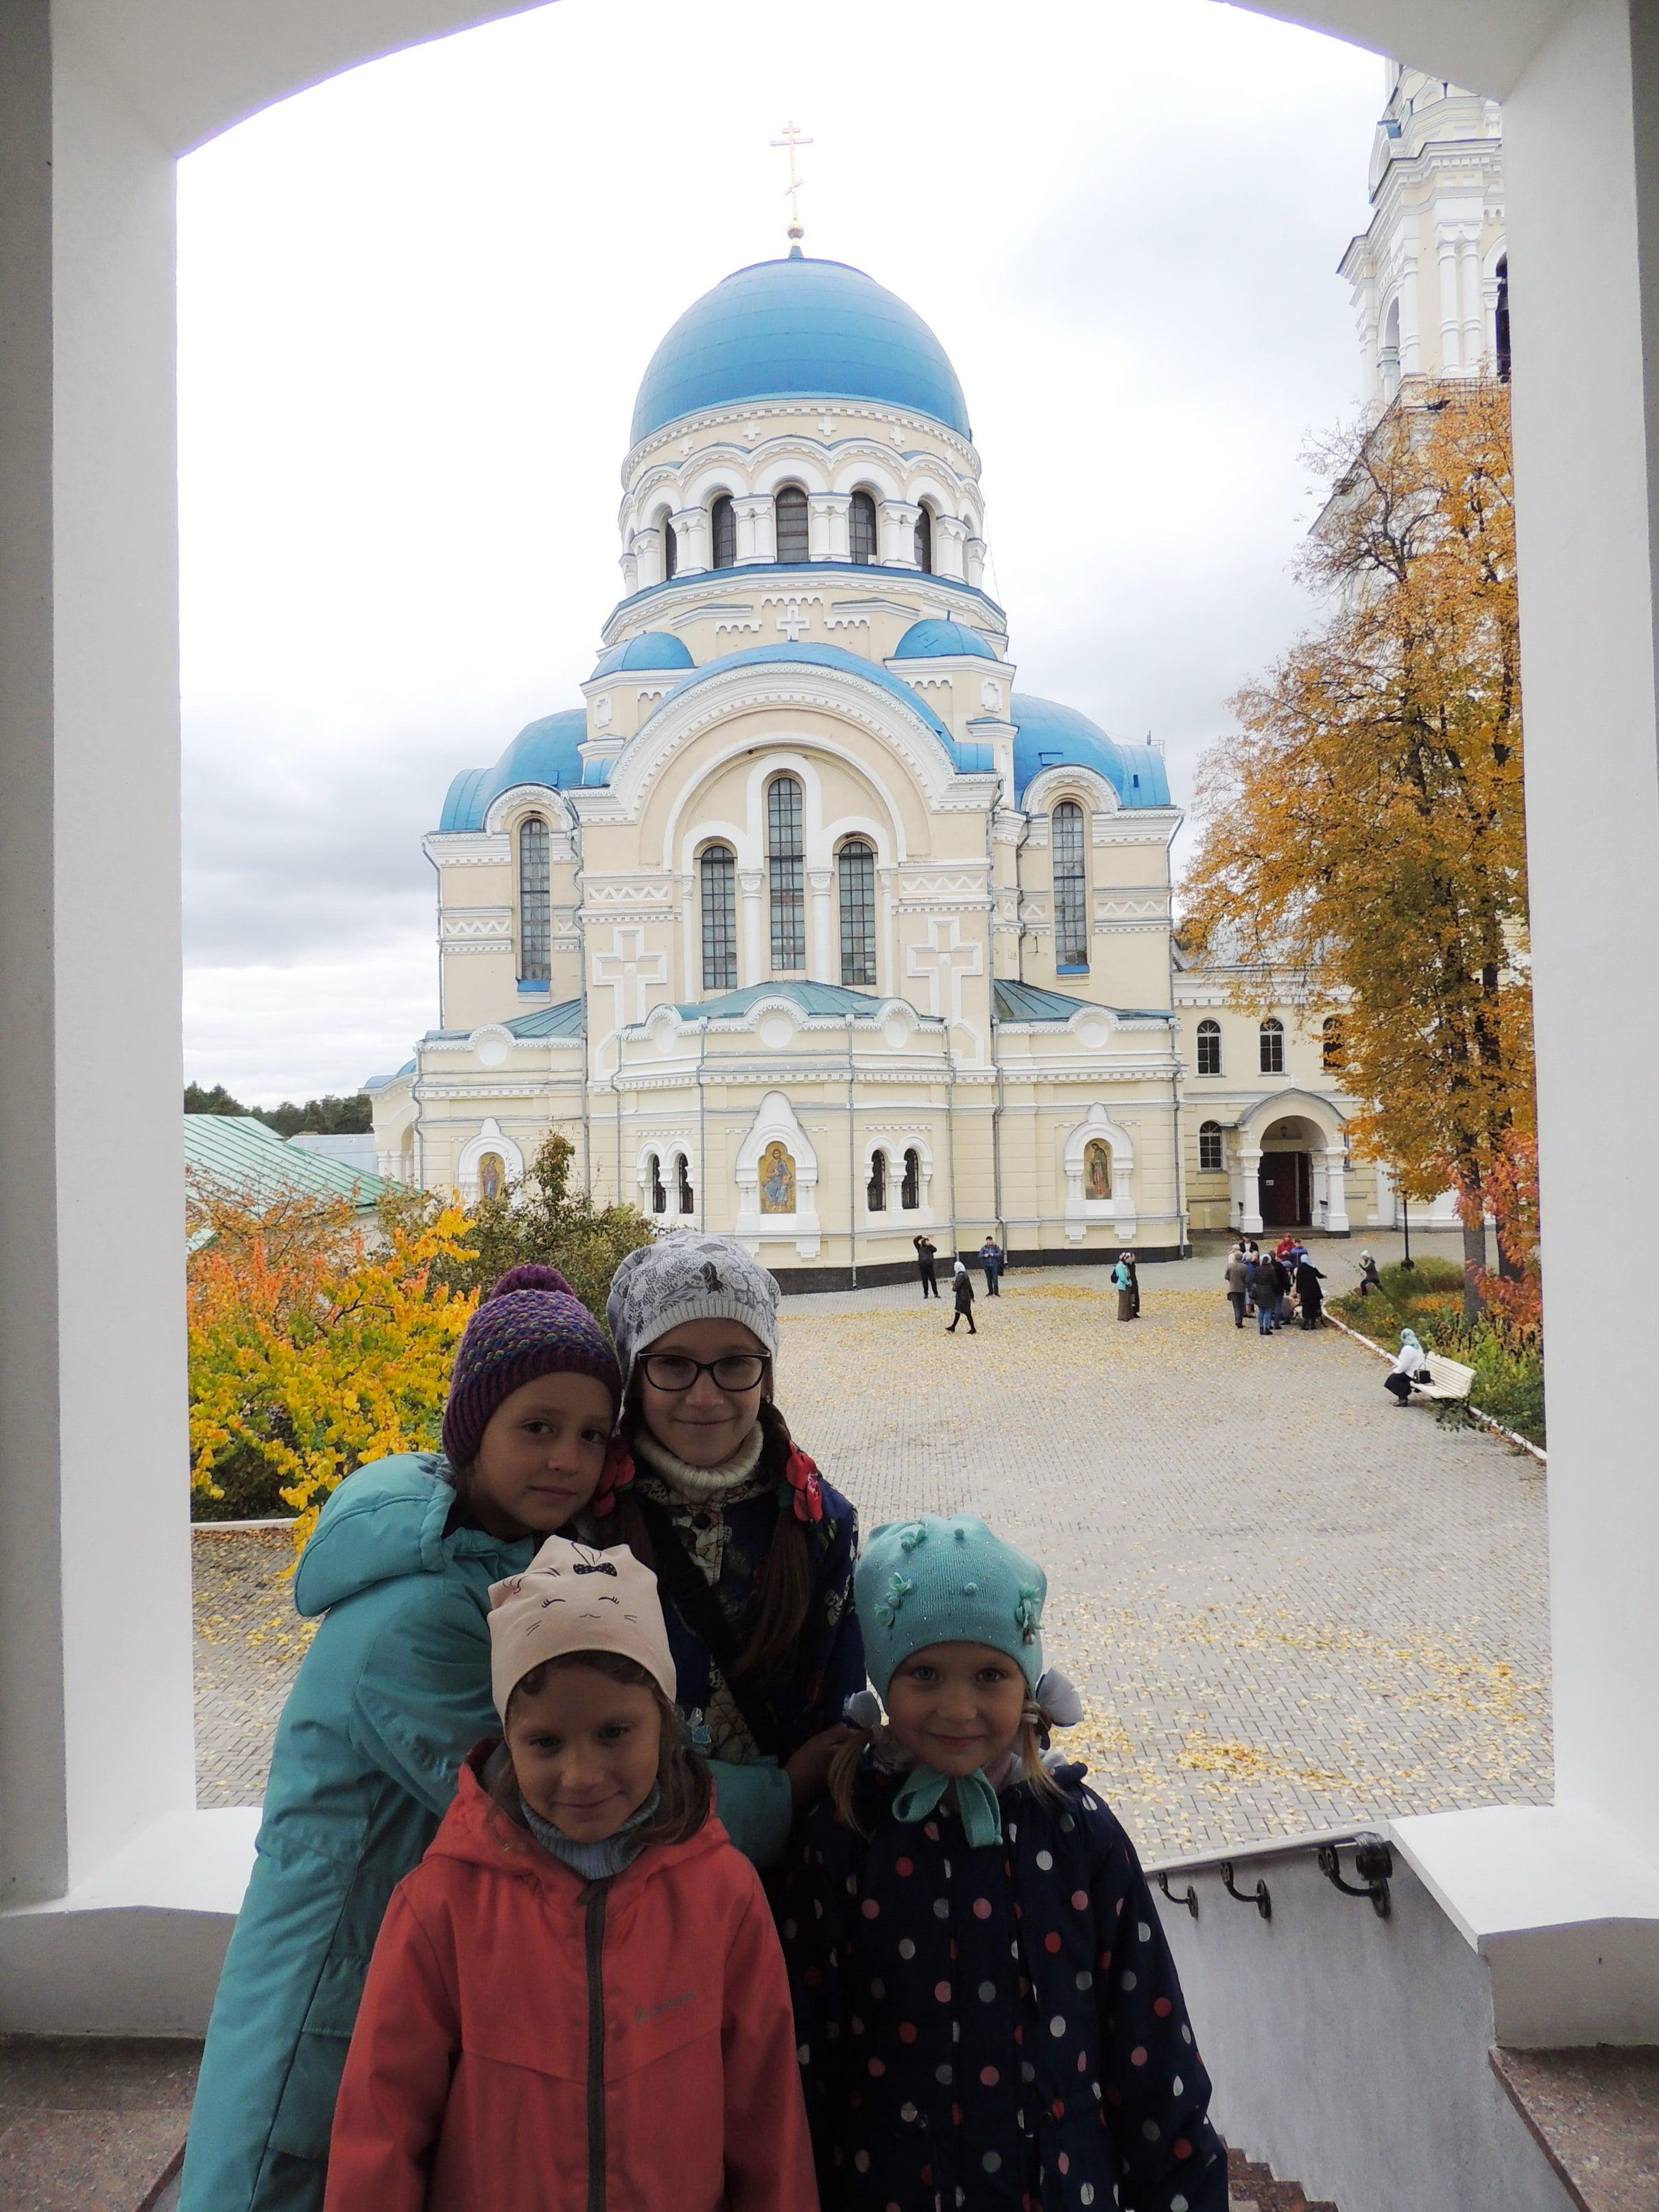 http://monuspen.ru/photoreports/7df66090564ac3621568a9866ab706al.JPG